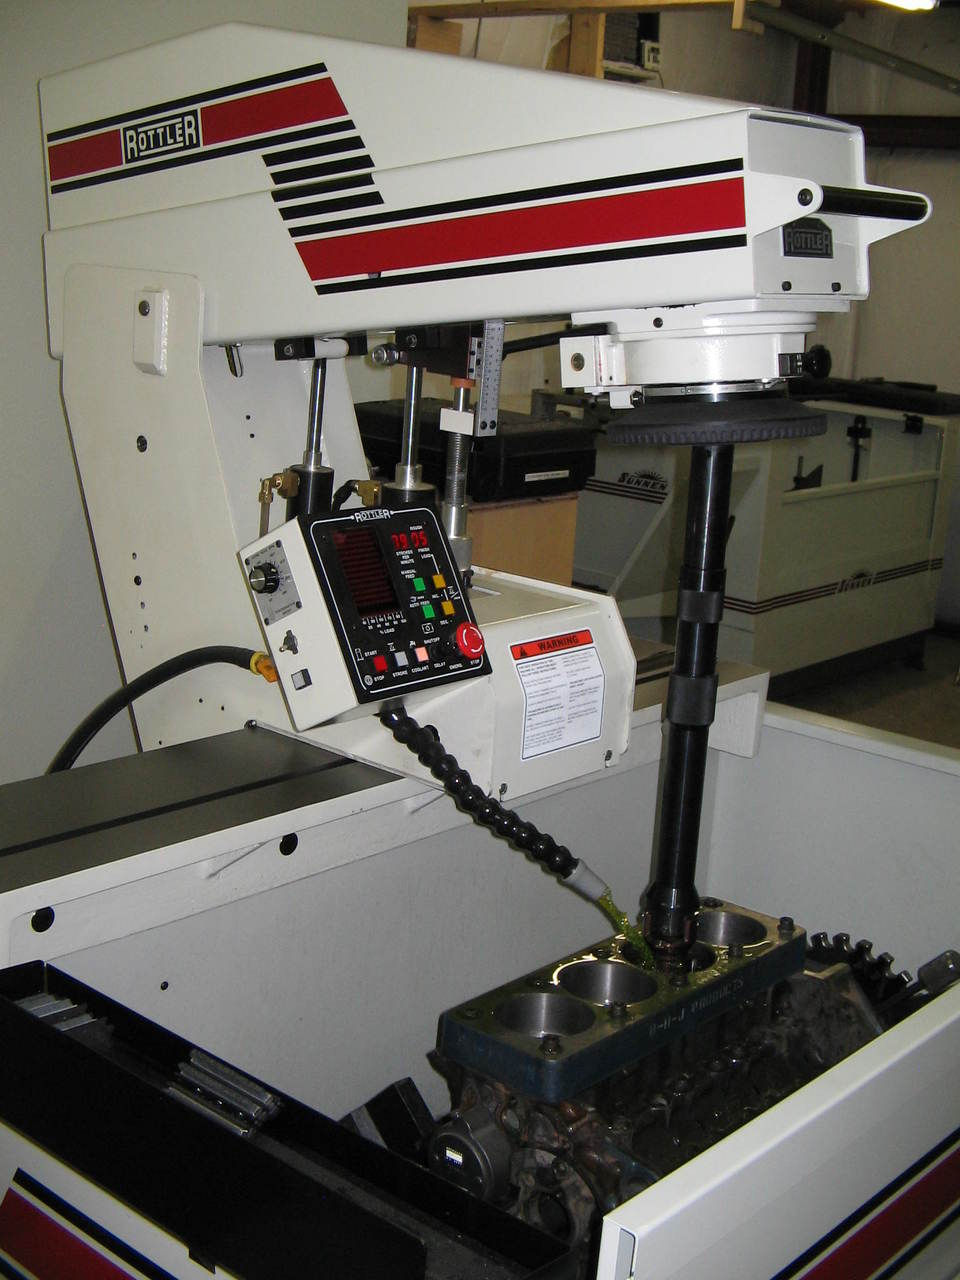 cylinder boring machine for sale craigslist